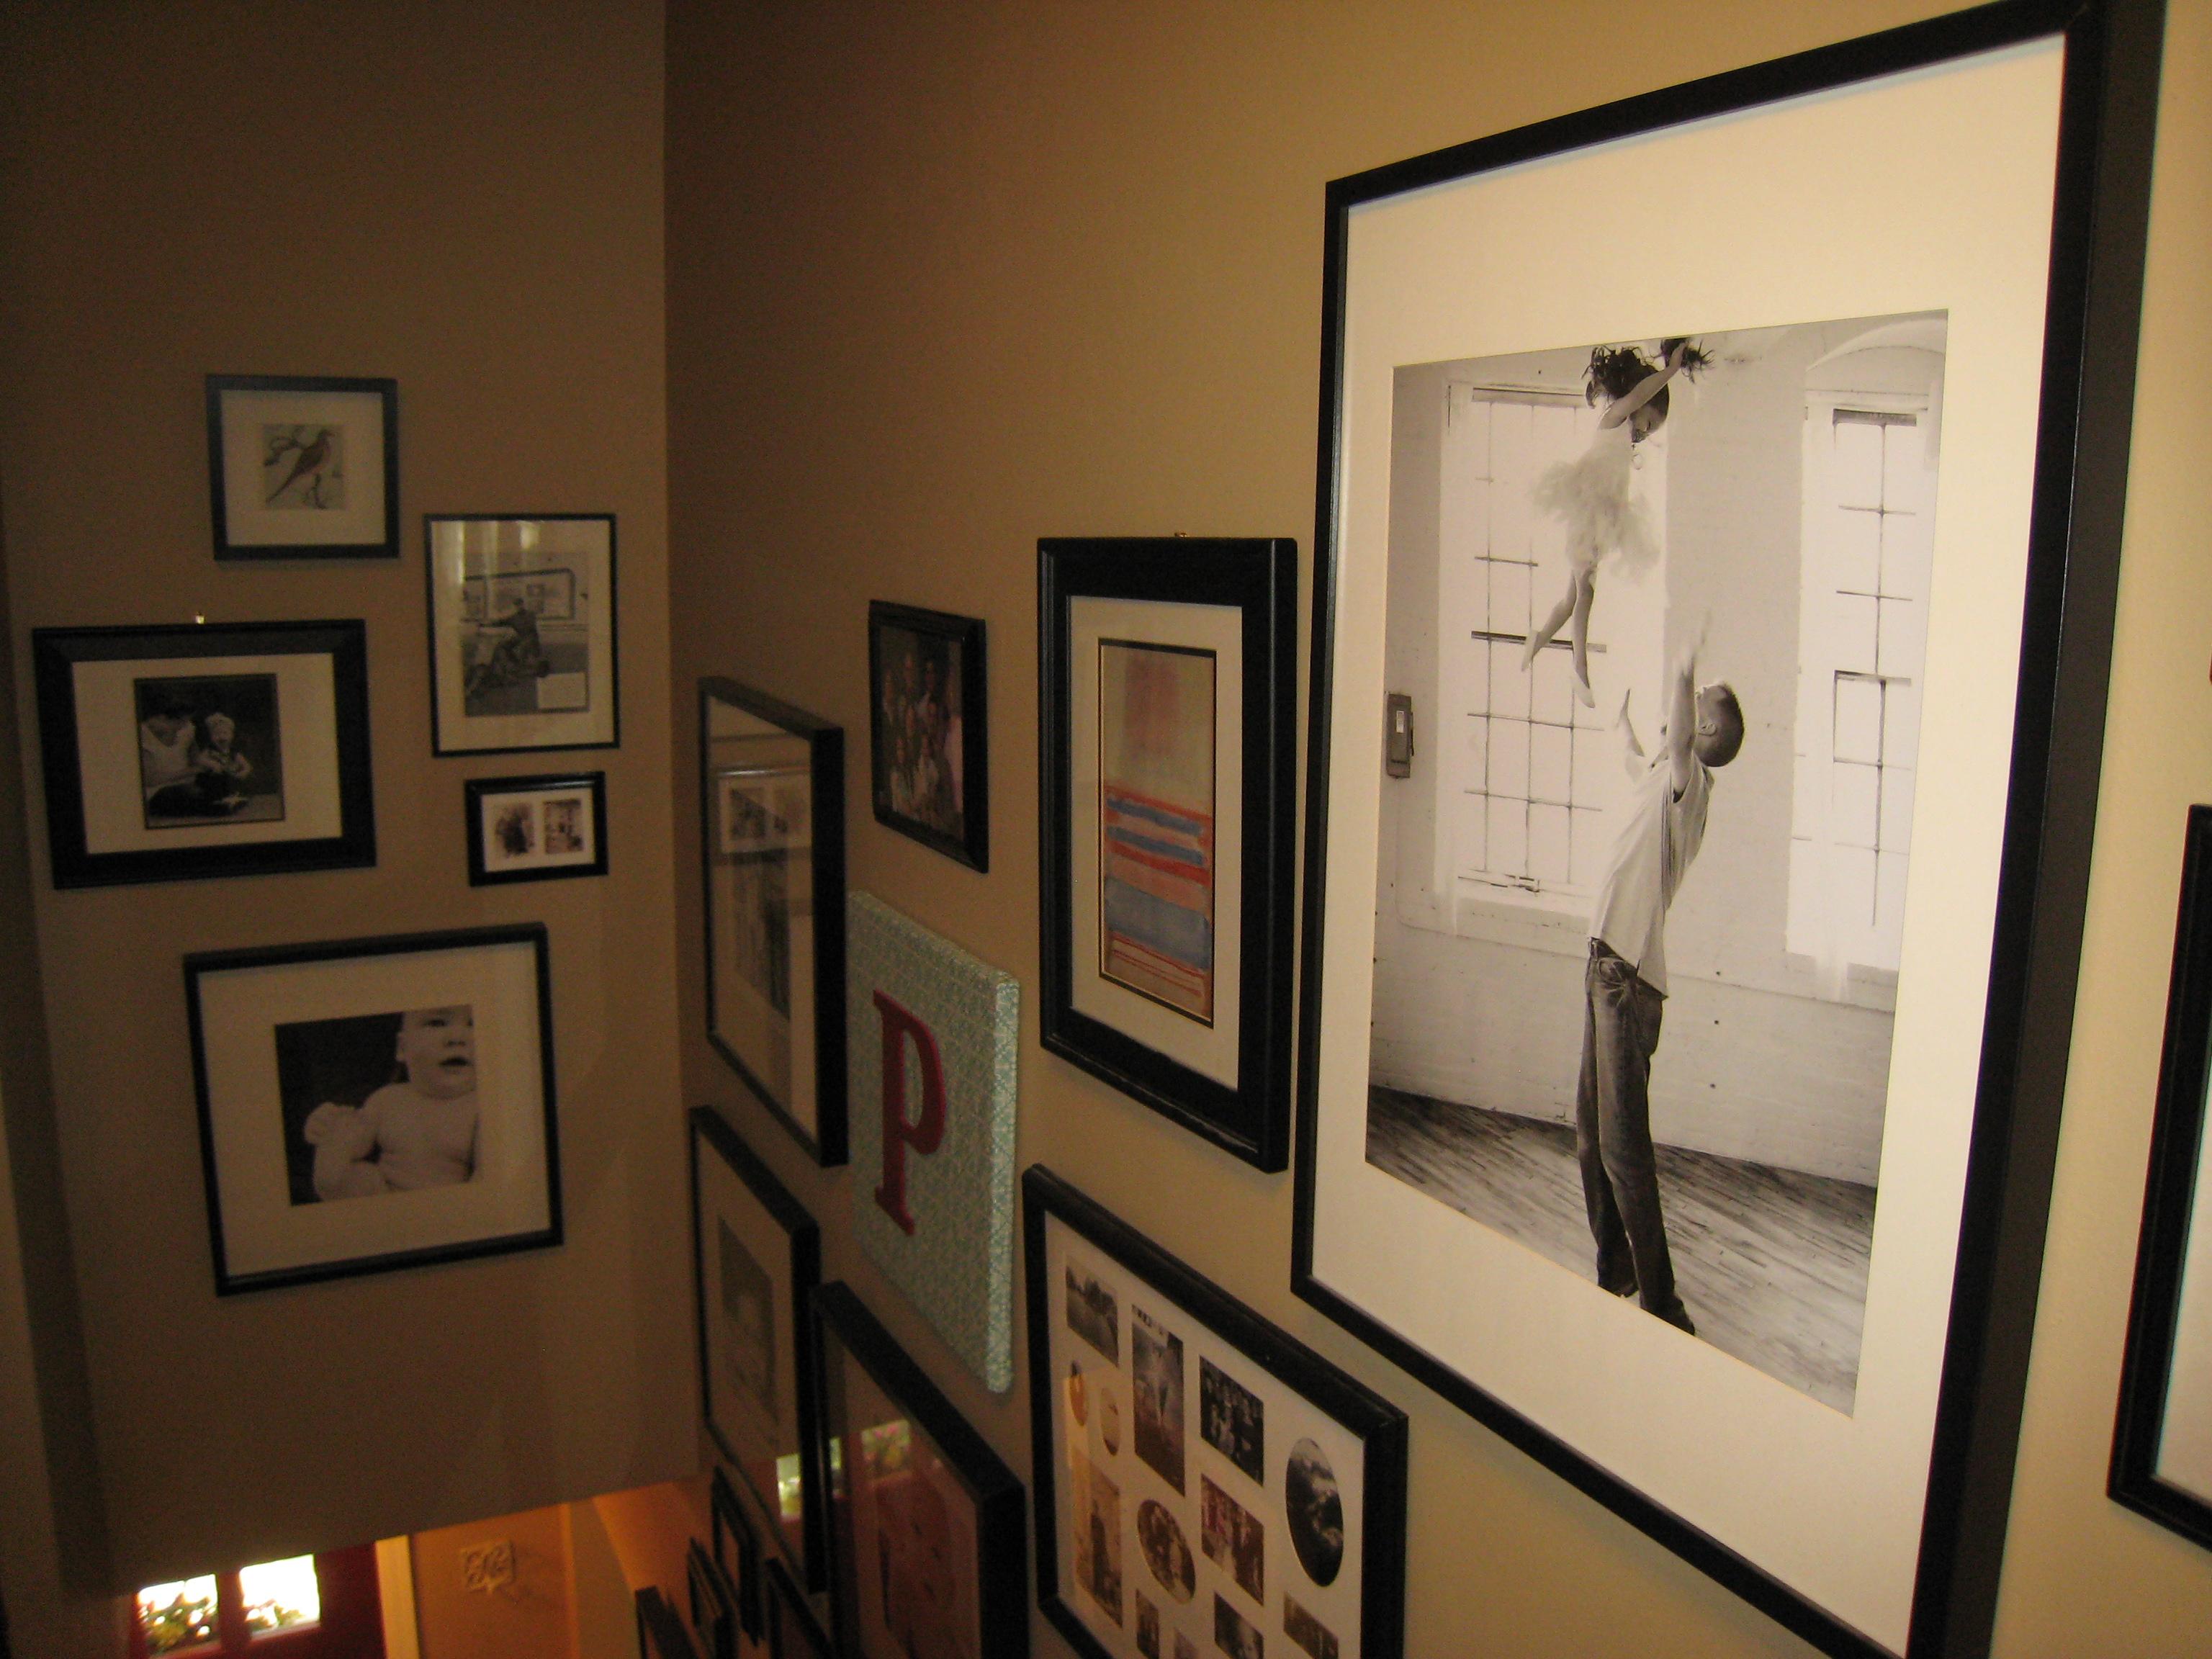 Arranging photos on a wall - Image